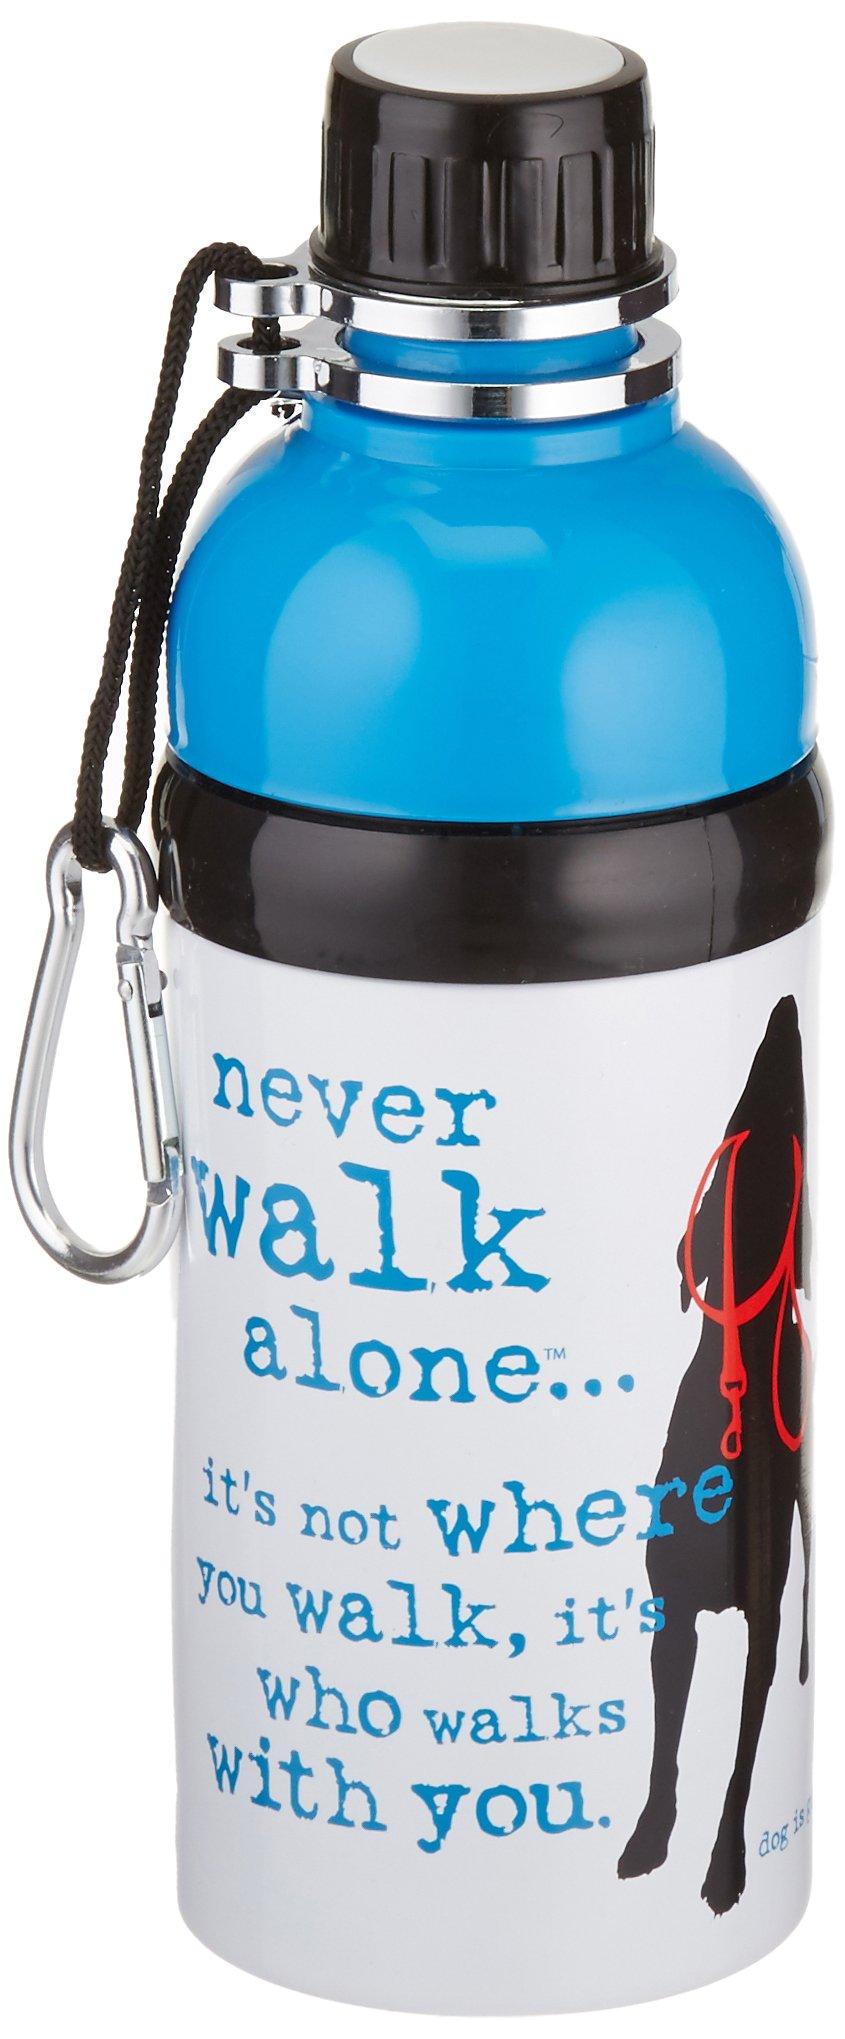 Dog is Good Never Walk Alone Pet Water Bottle, 16 oz